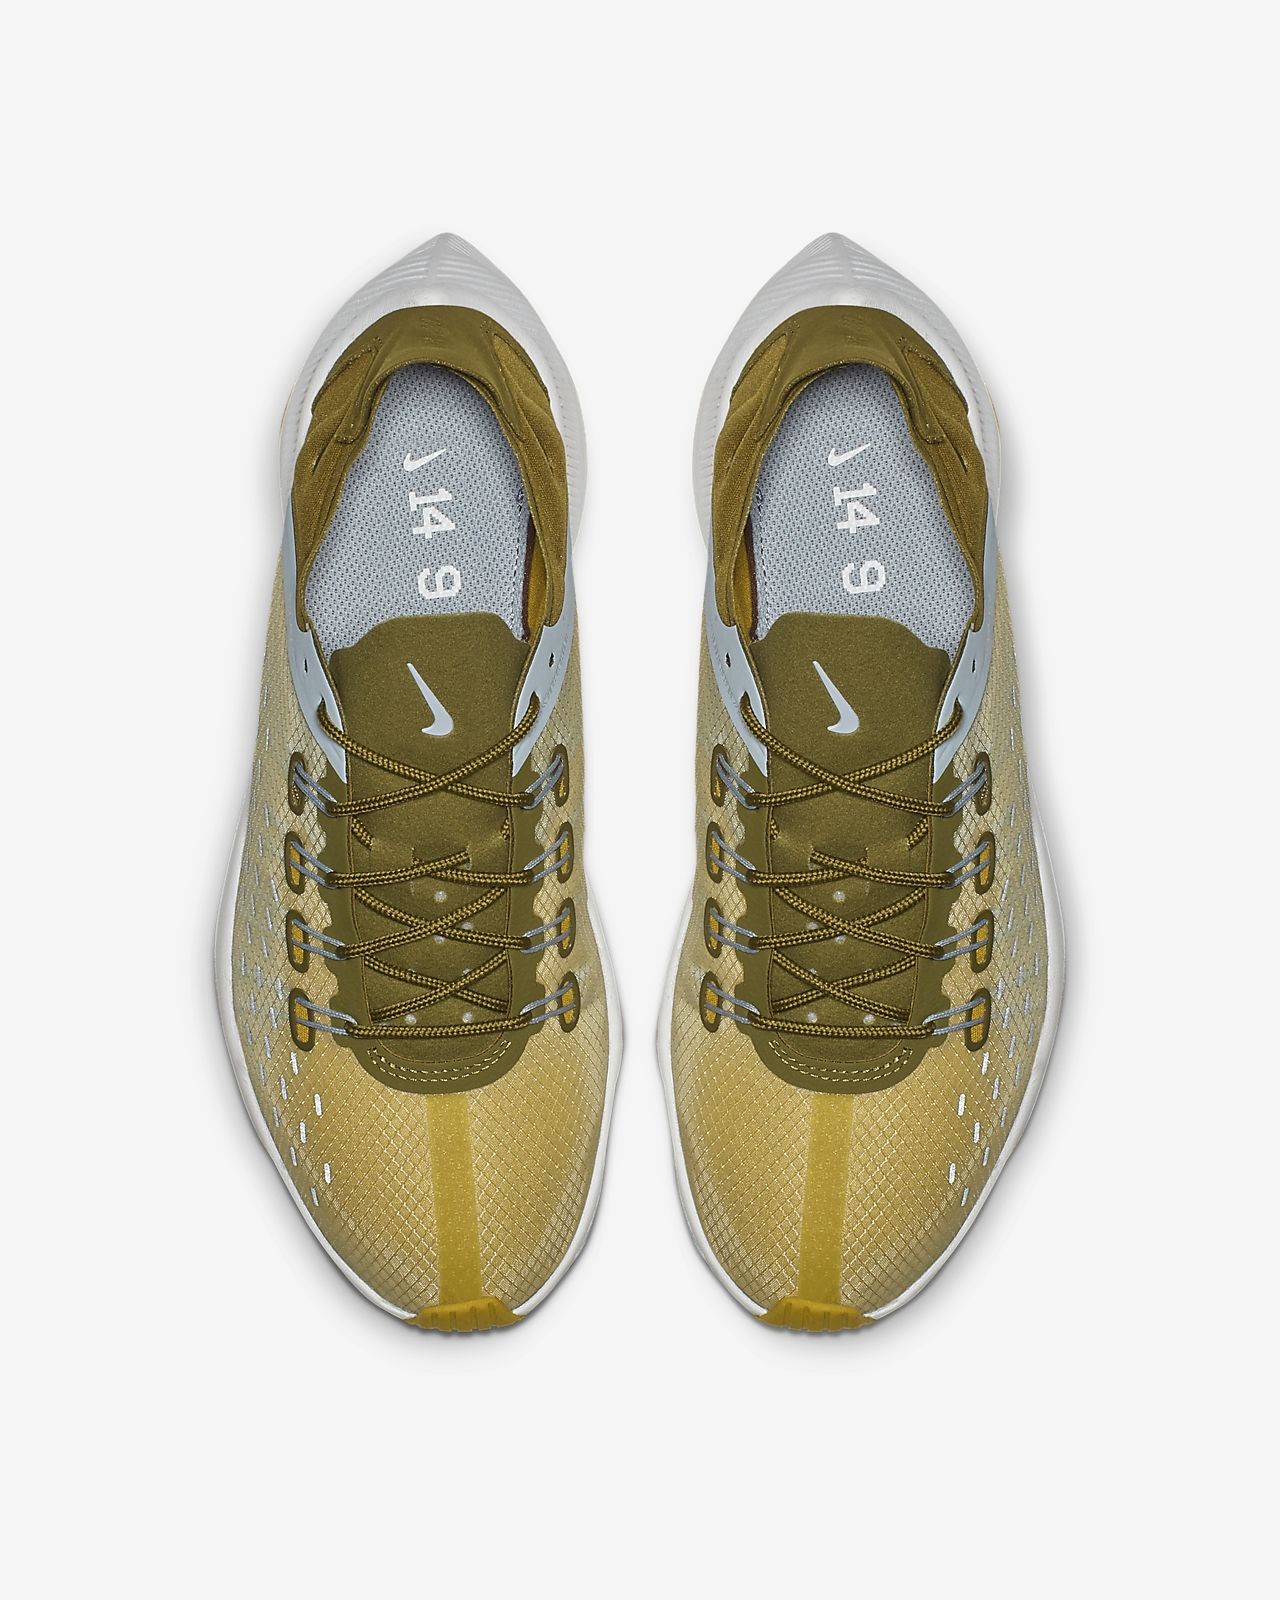 hot sale online 9f3df b63ed Low Resolution Nike EXP-X14 Women s Shoe Nike EXP-X14 Women s Shoe